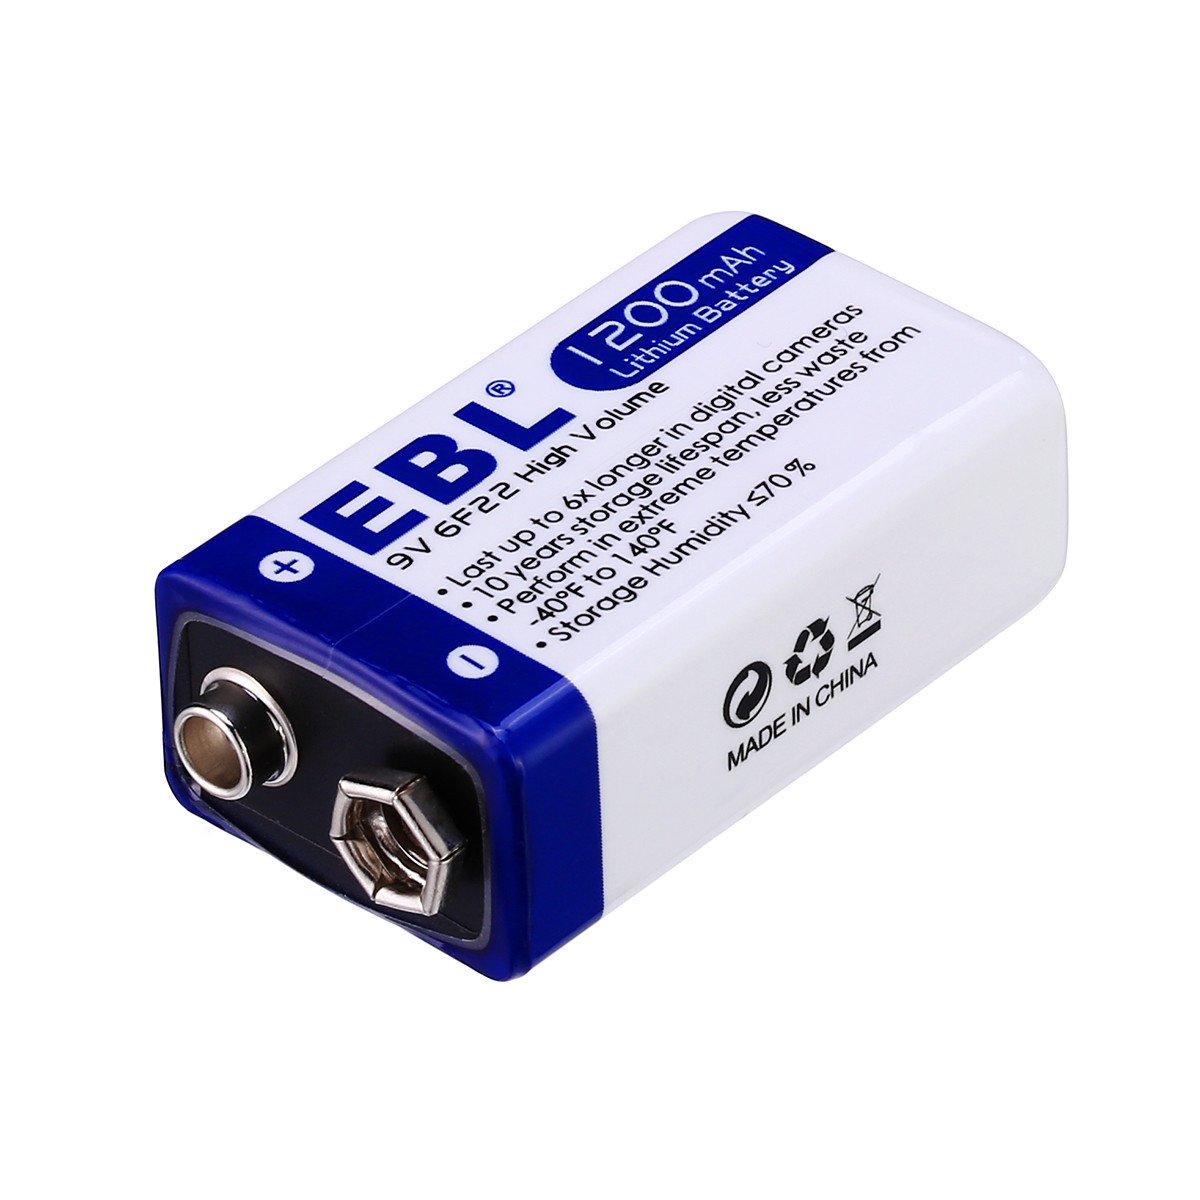 EBL 9V Block 1200mAh Lithium Batterie 6xLonglife 2 Stück